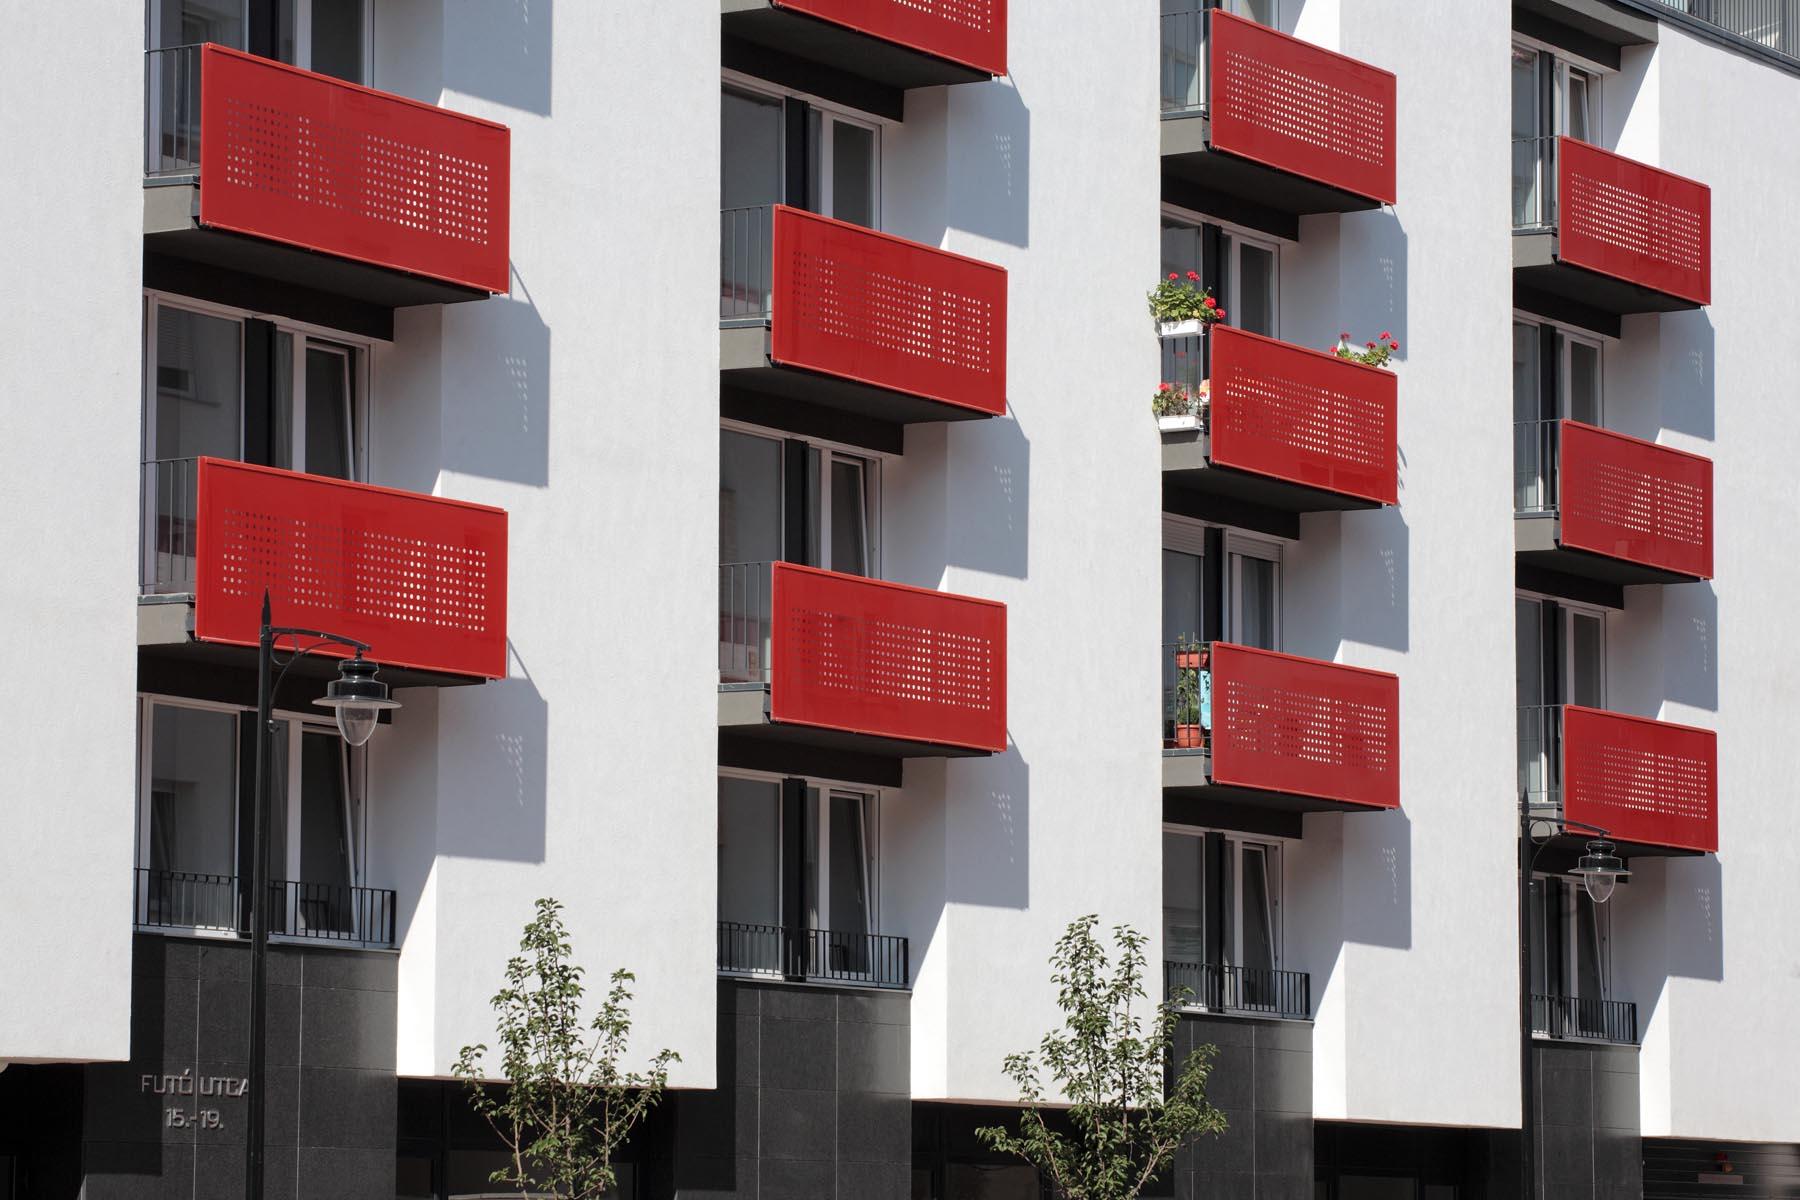 Residential Building In Fut 211 Utca Hajnal 201 P 237 T 233 Szeti Iroda